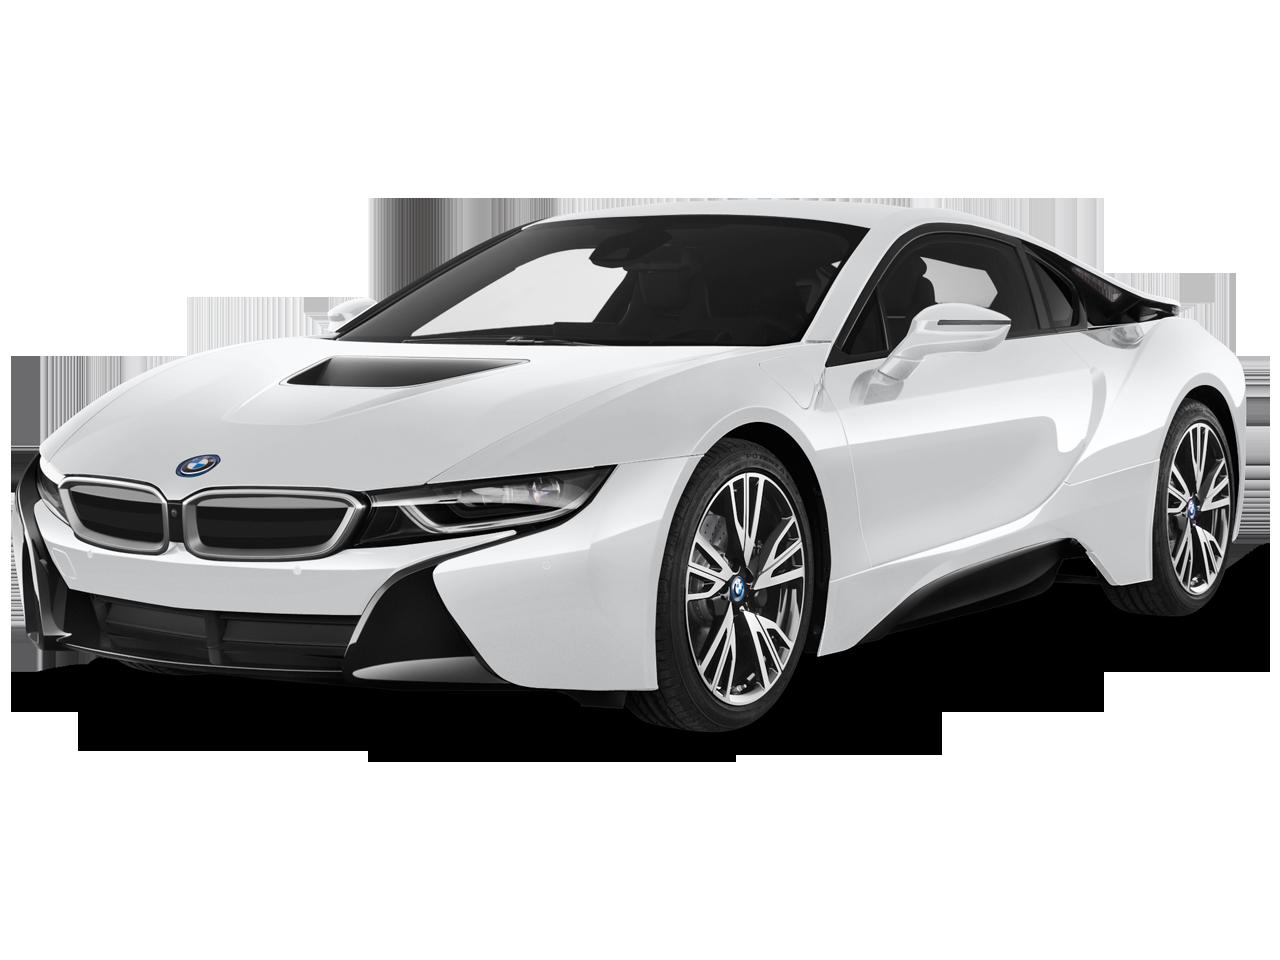 Download I8 Car I3 Bmw 2017 Free Clipart HQ HQ PNG Image ...